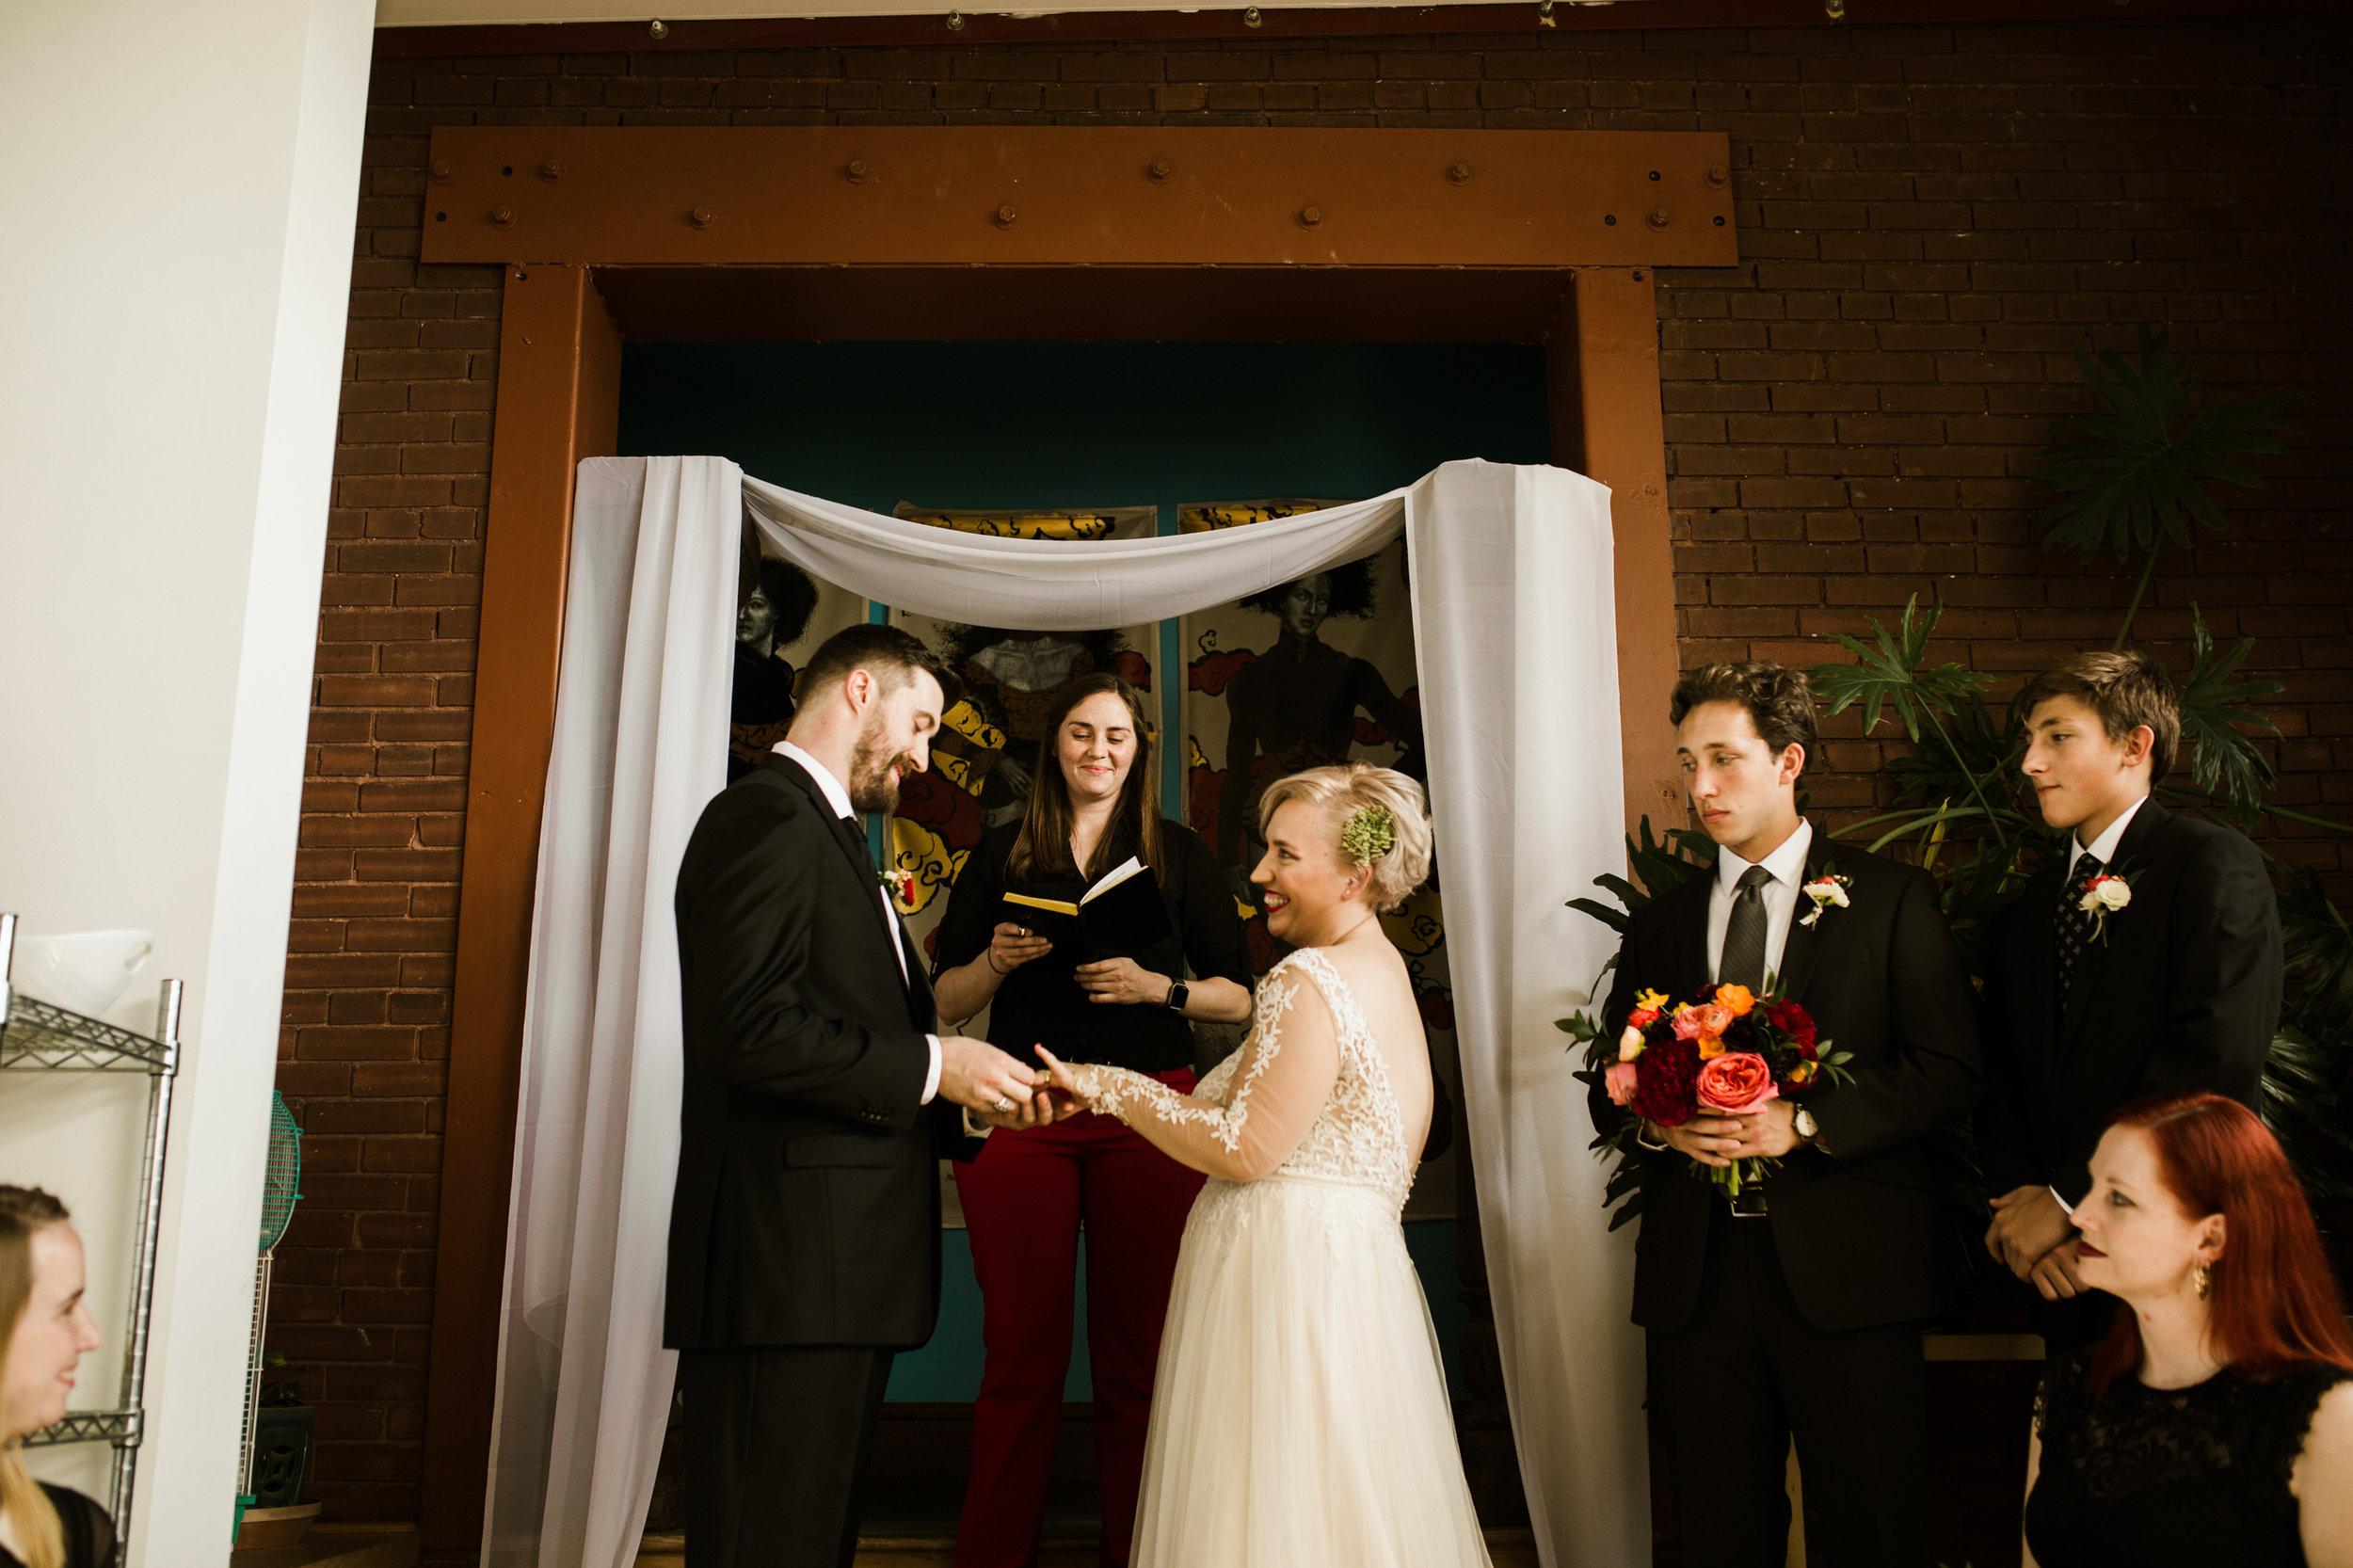 Kentucky Wedding Louisville Wedding Photographer 2018 Crystal Ludwick Photo Louisville Wedding Photographer Kentucky Wedding Photographer (54 of 105).jpg